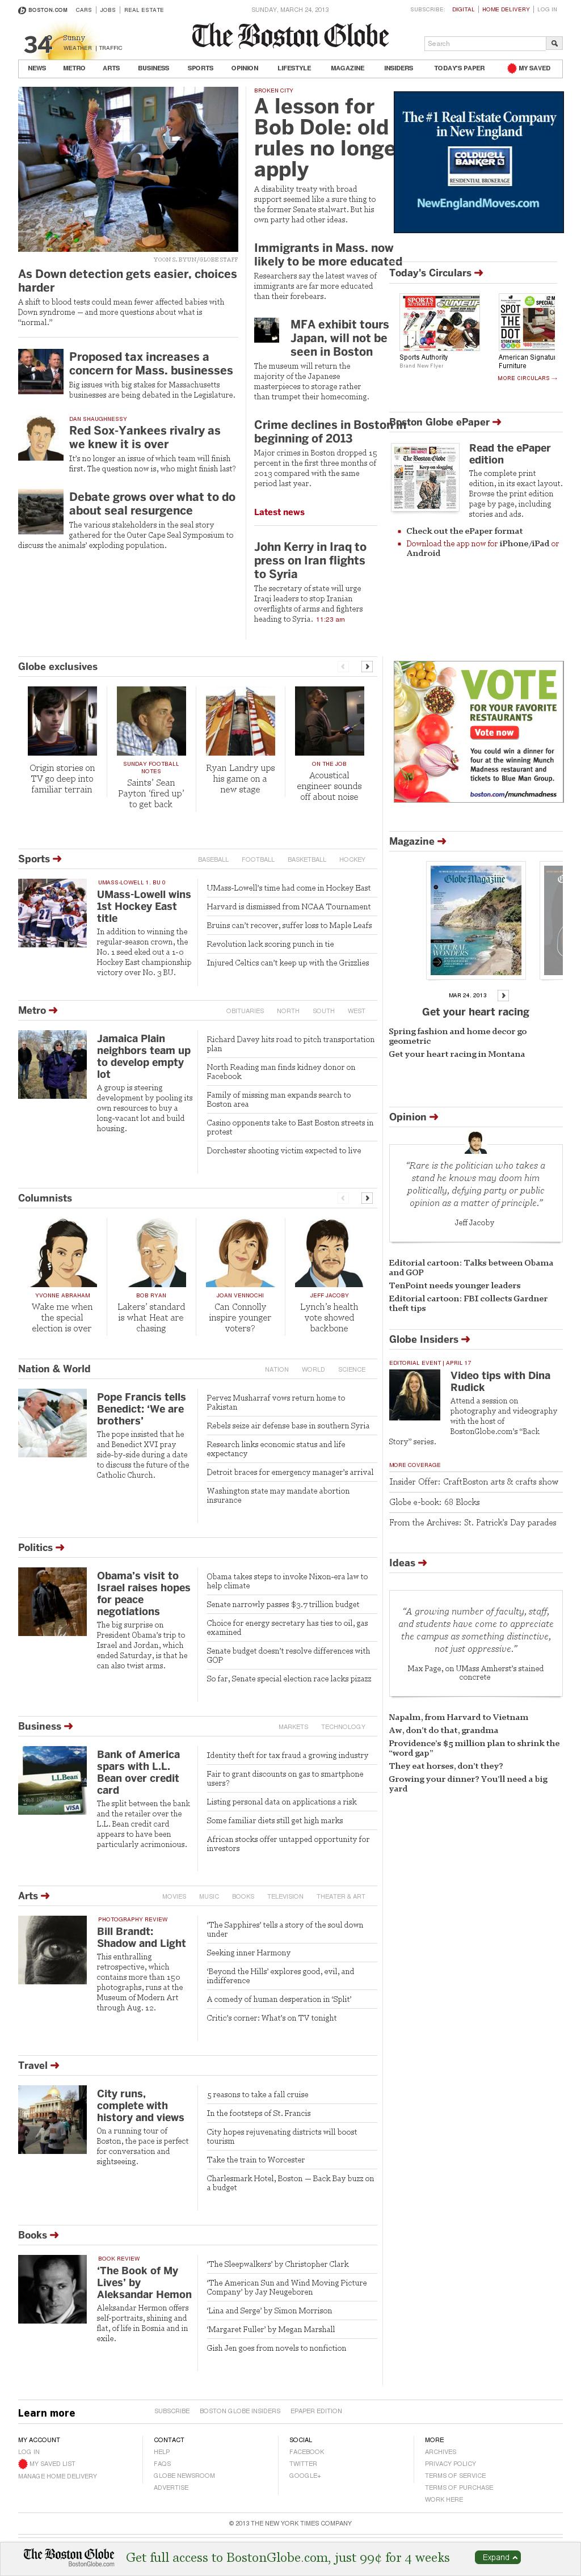 The Boston Globe at Sunday March 24, 2013, 1:04 p.m. UTC